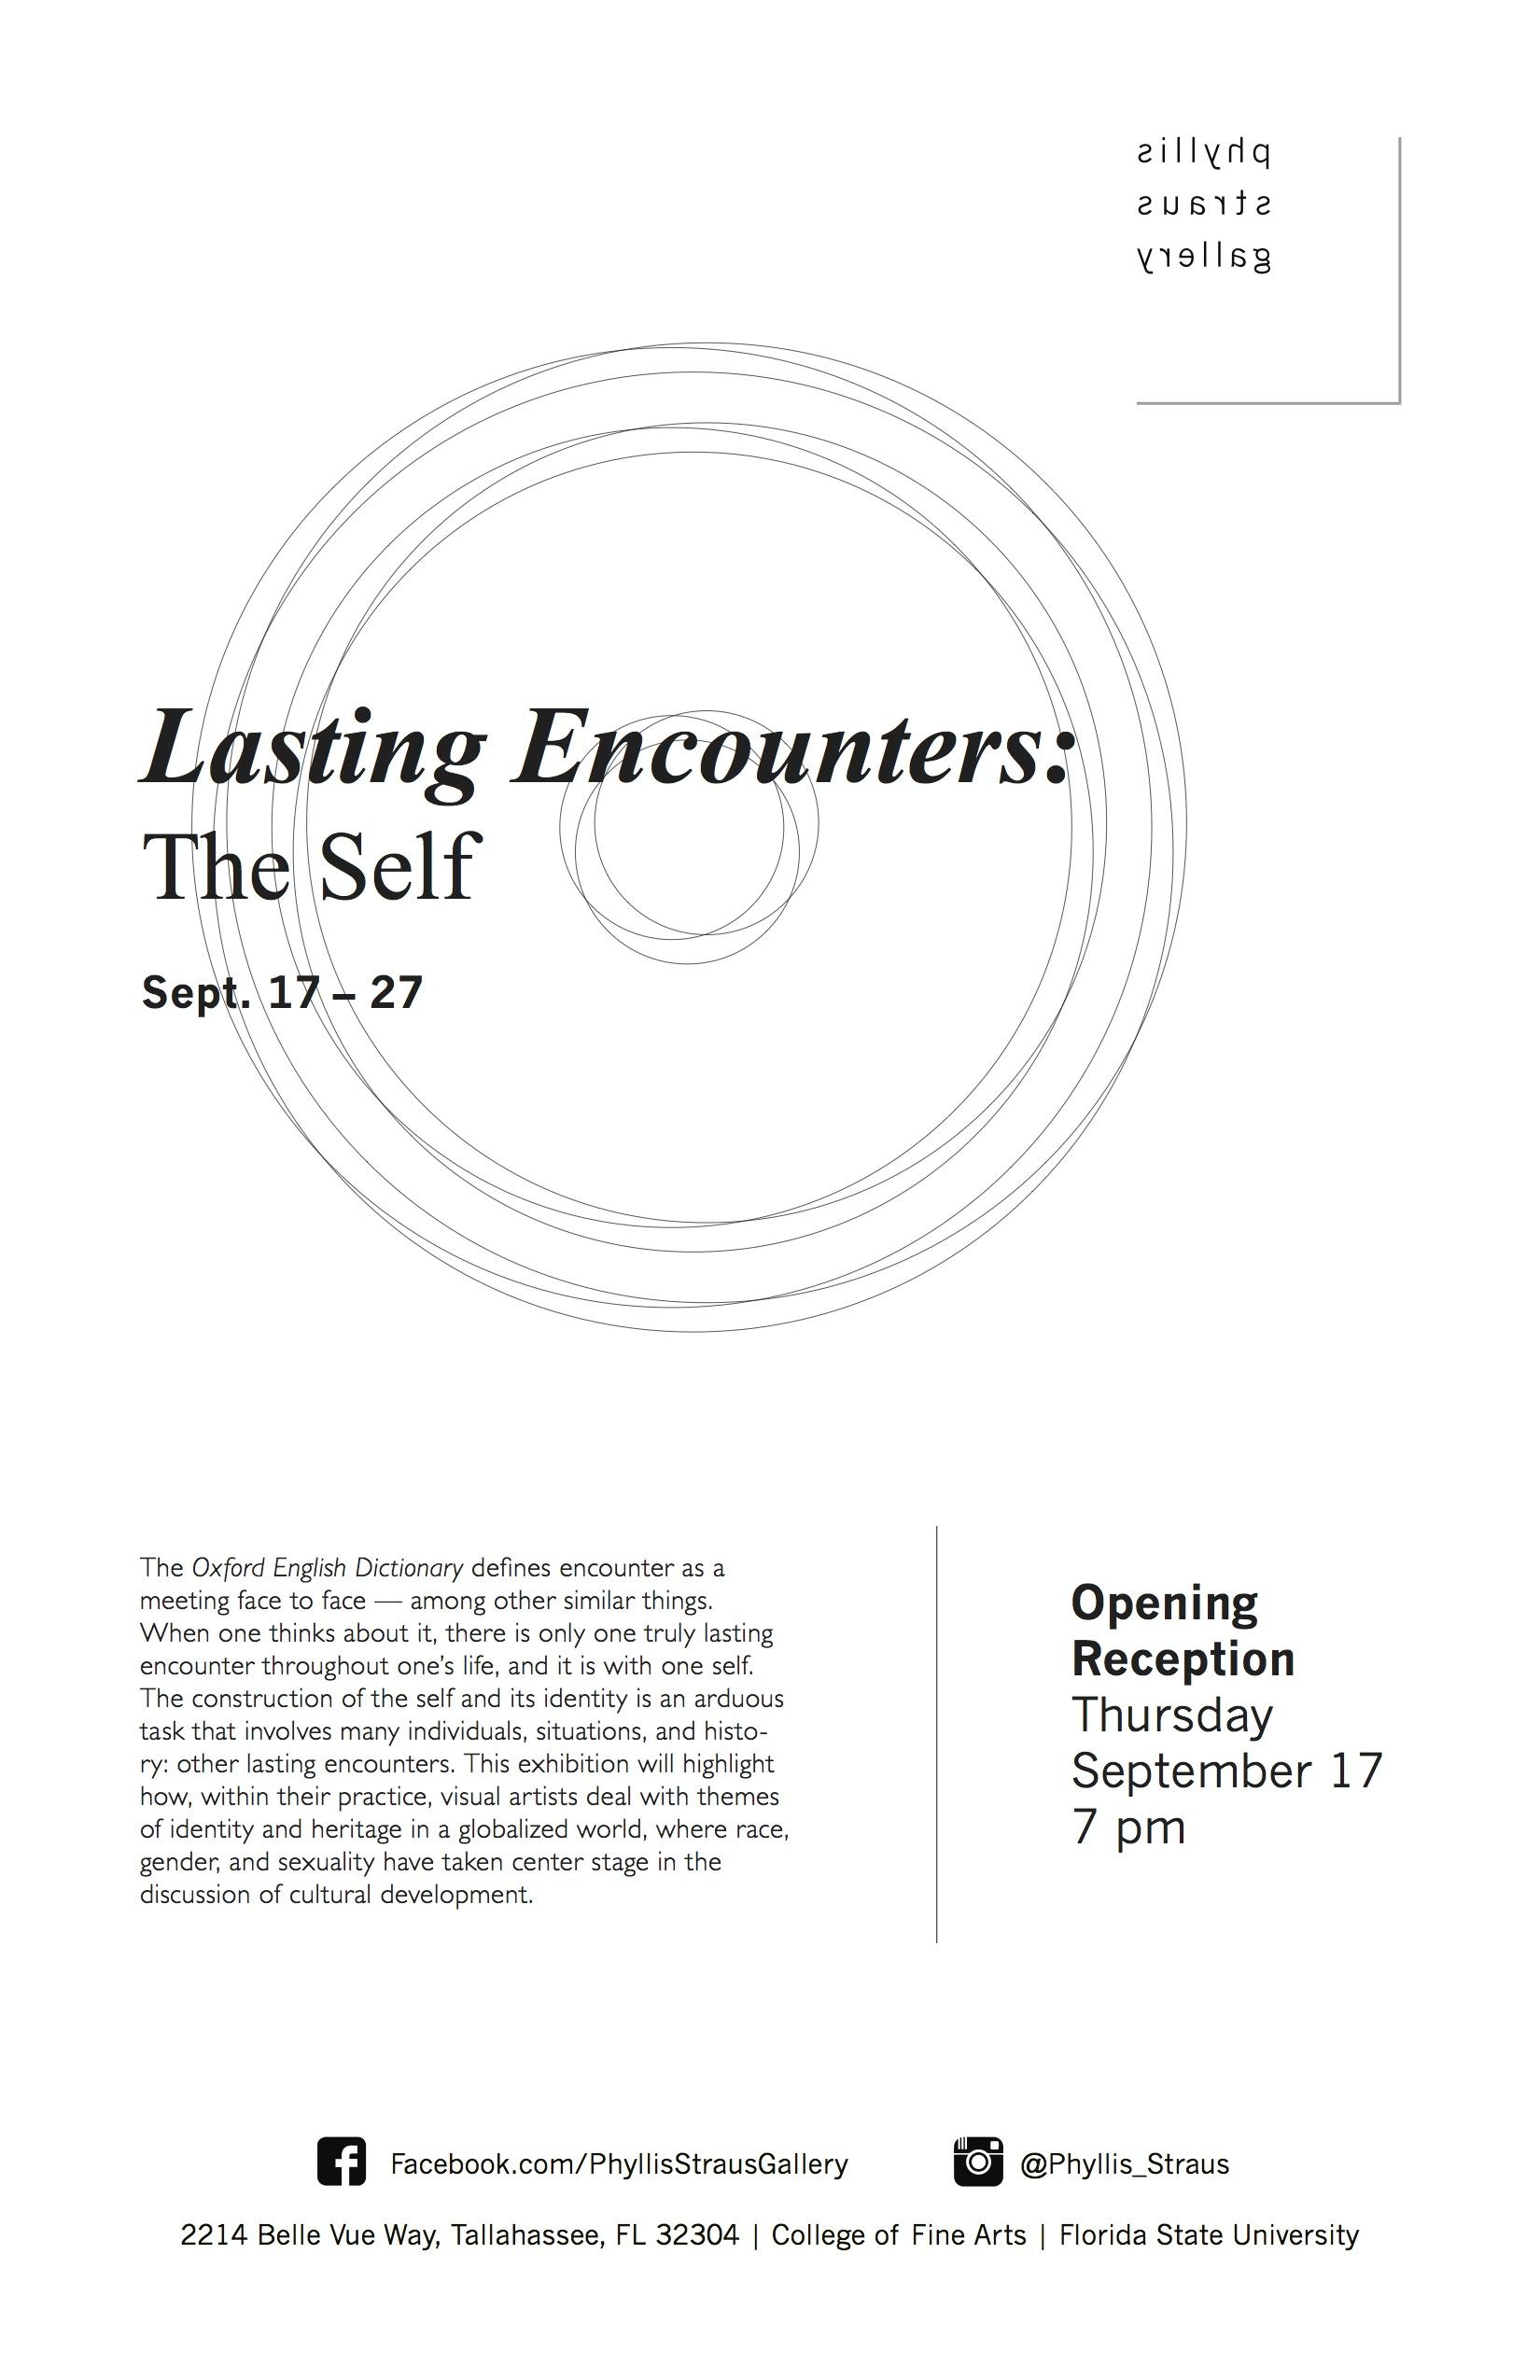 Lasting Encounters Exhibition Poster